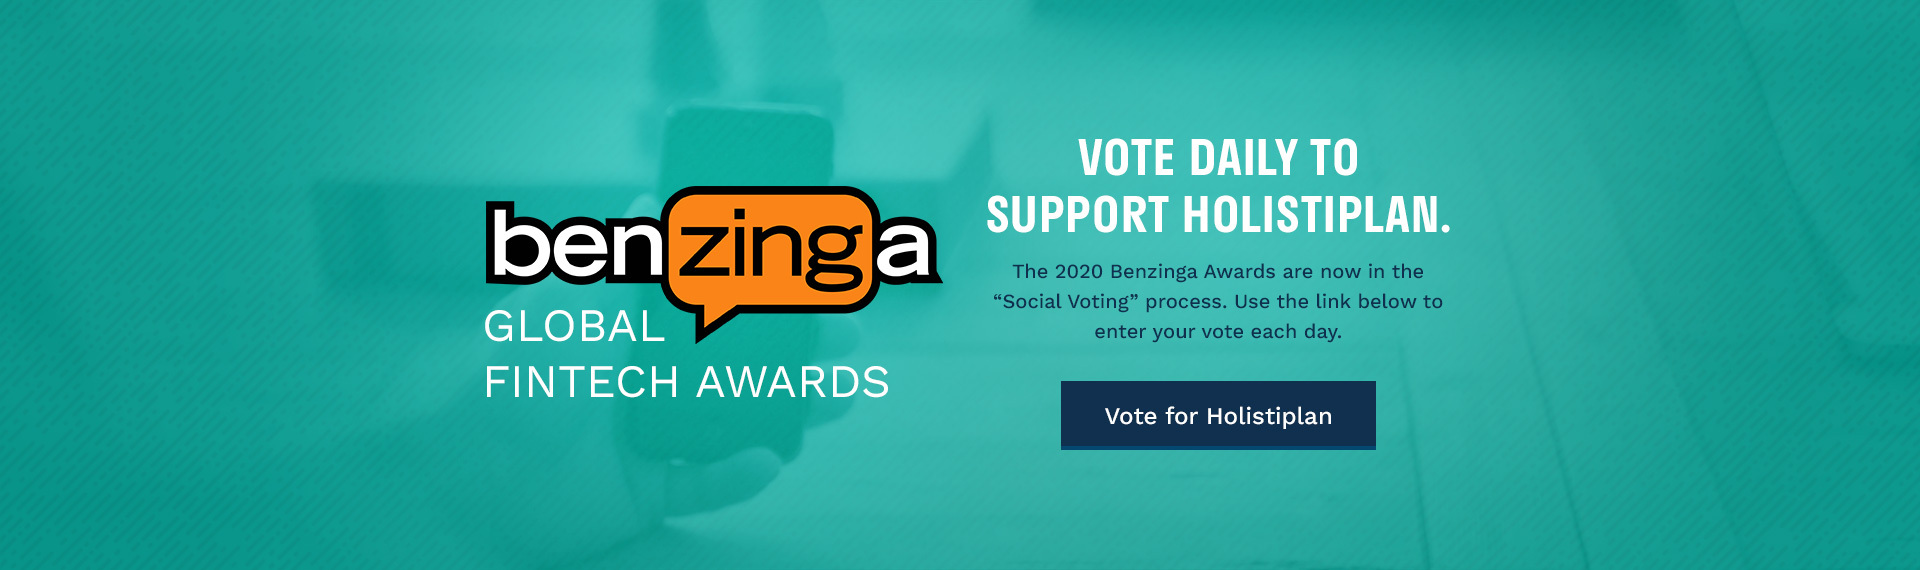 Holistiplan Benzinga Global Fintech Awards Nomination - Vote